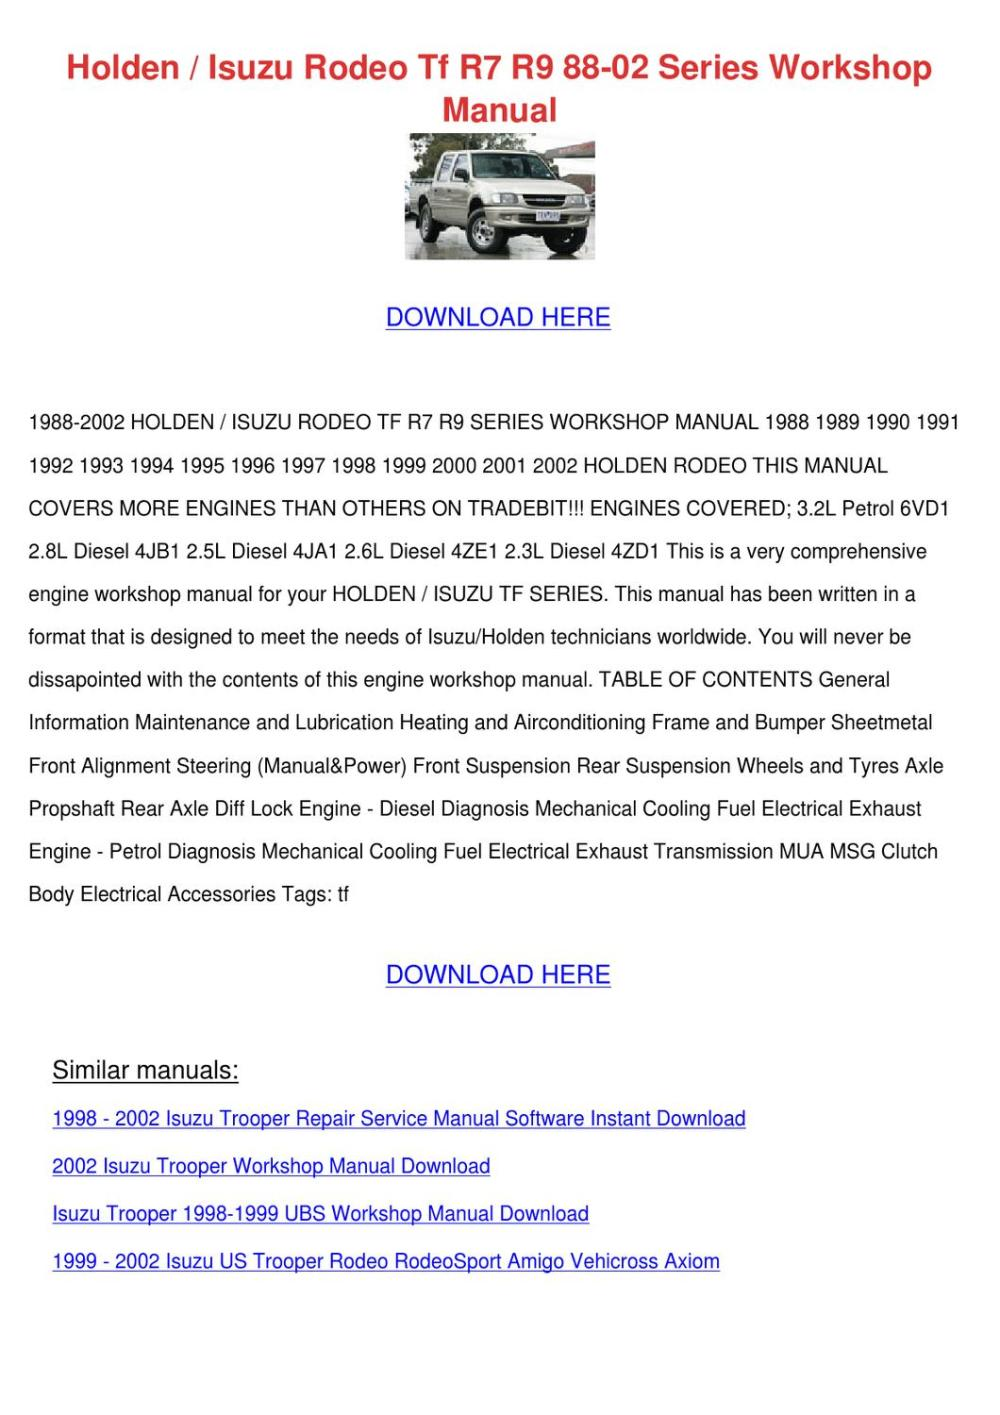 medium resolution of holden isuzu rodeo tf r7 r9 88 02 series work